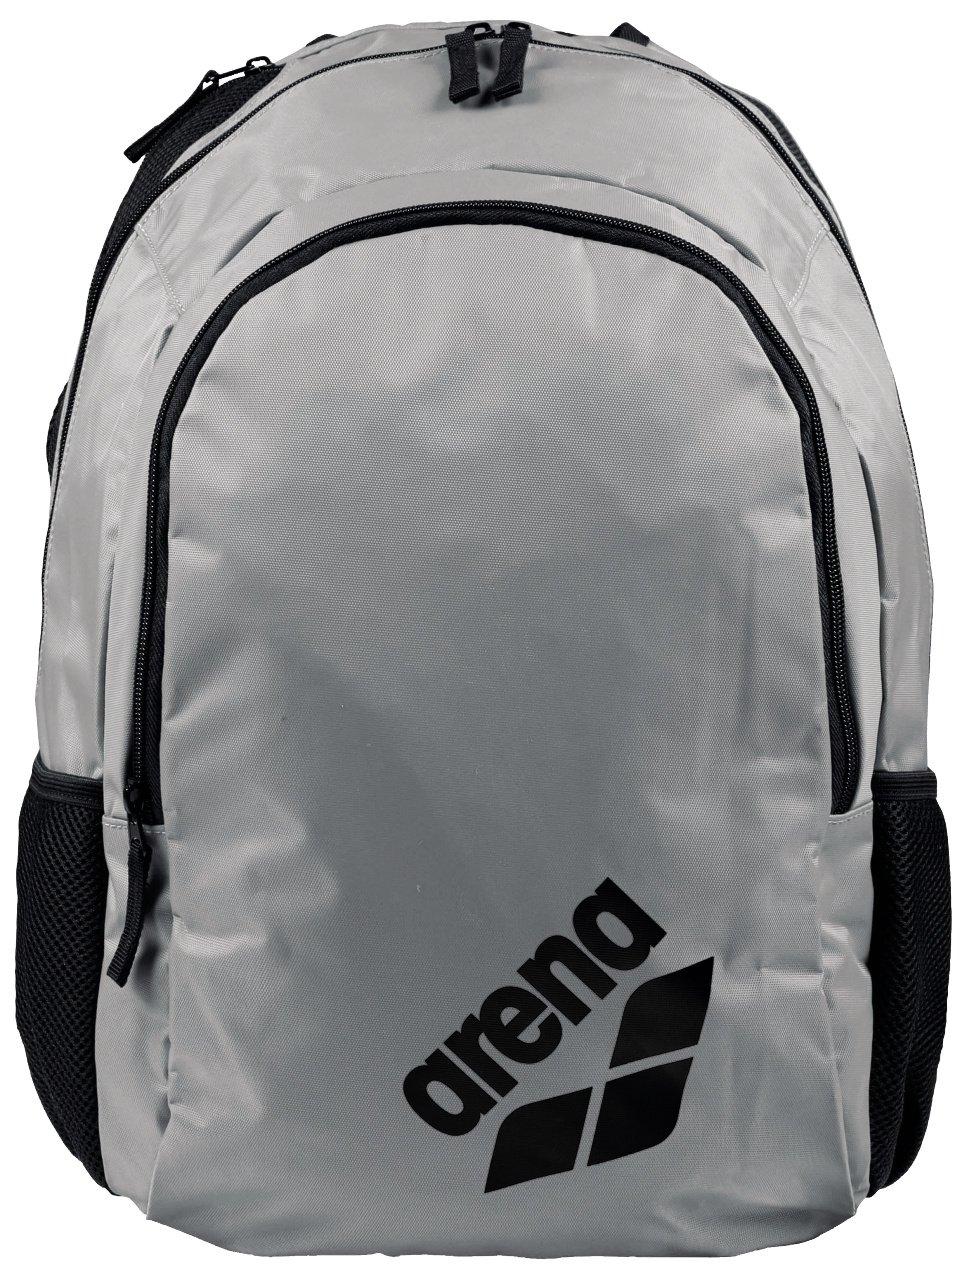 Arena Spiky 2 Swim Backpack, Silver Team